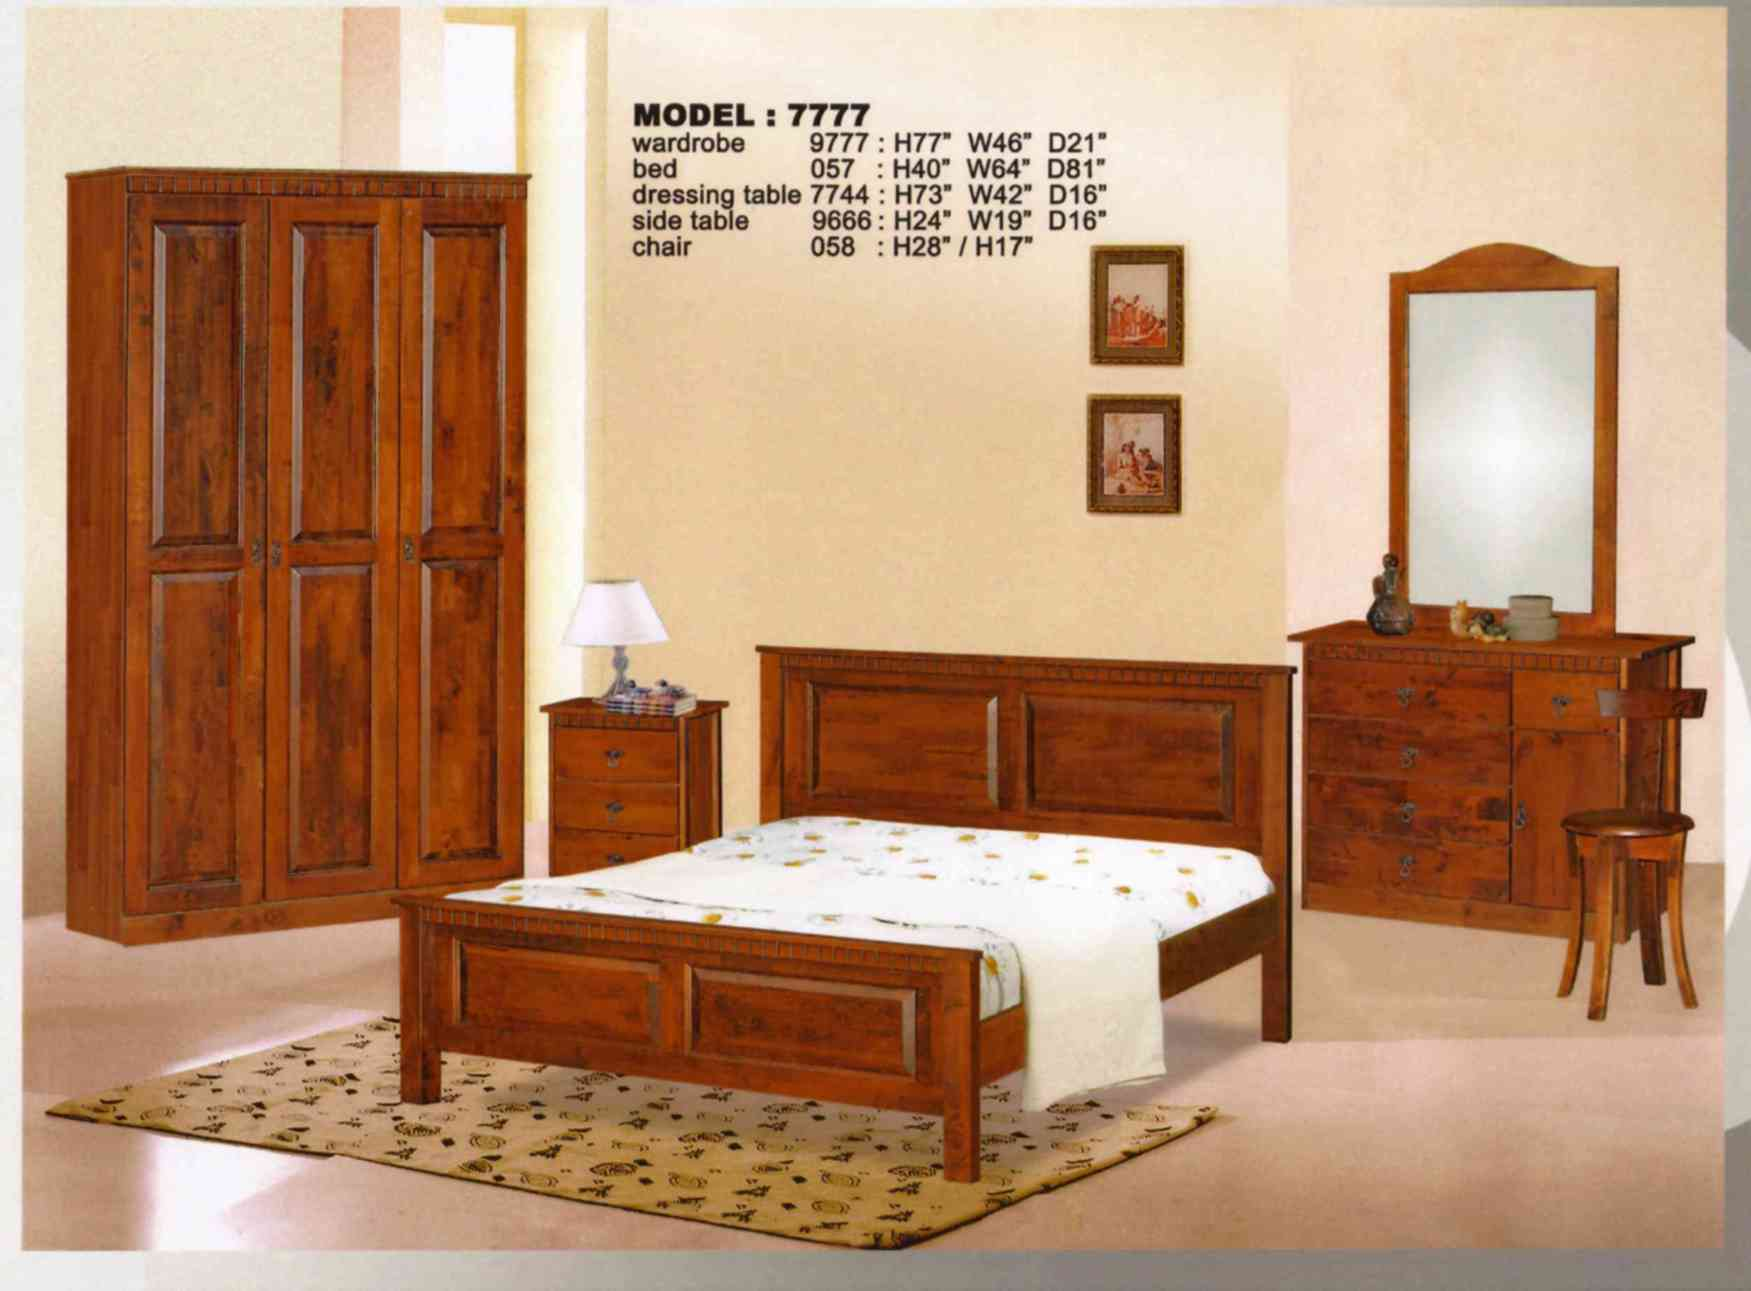 Bedroom Sets 2014 bedroom set kuala lumpur, bedroom set kuala lumpur suppliers and